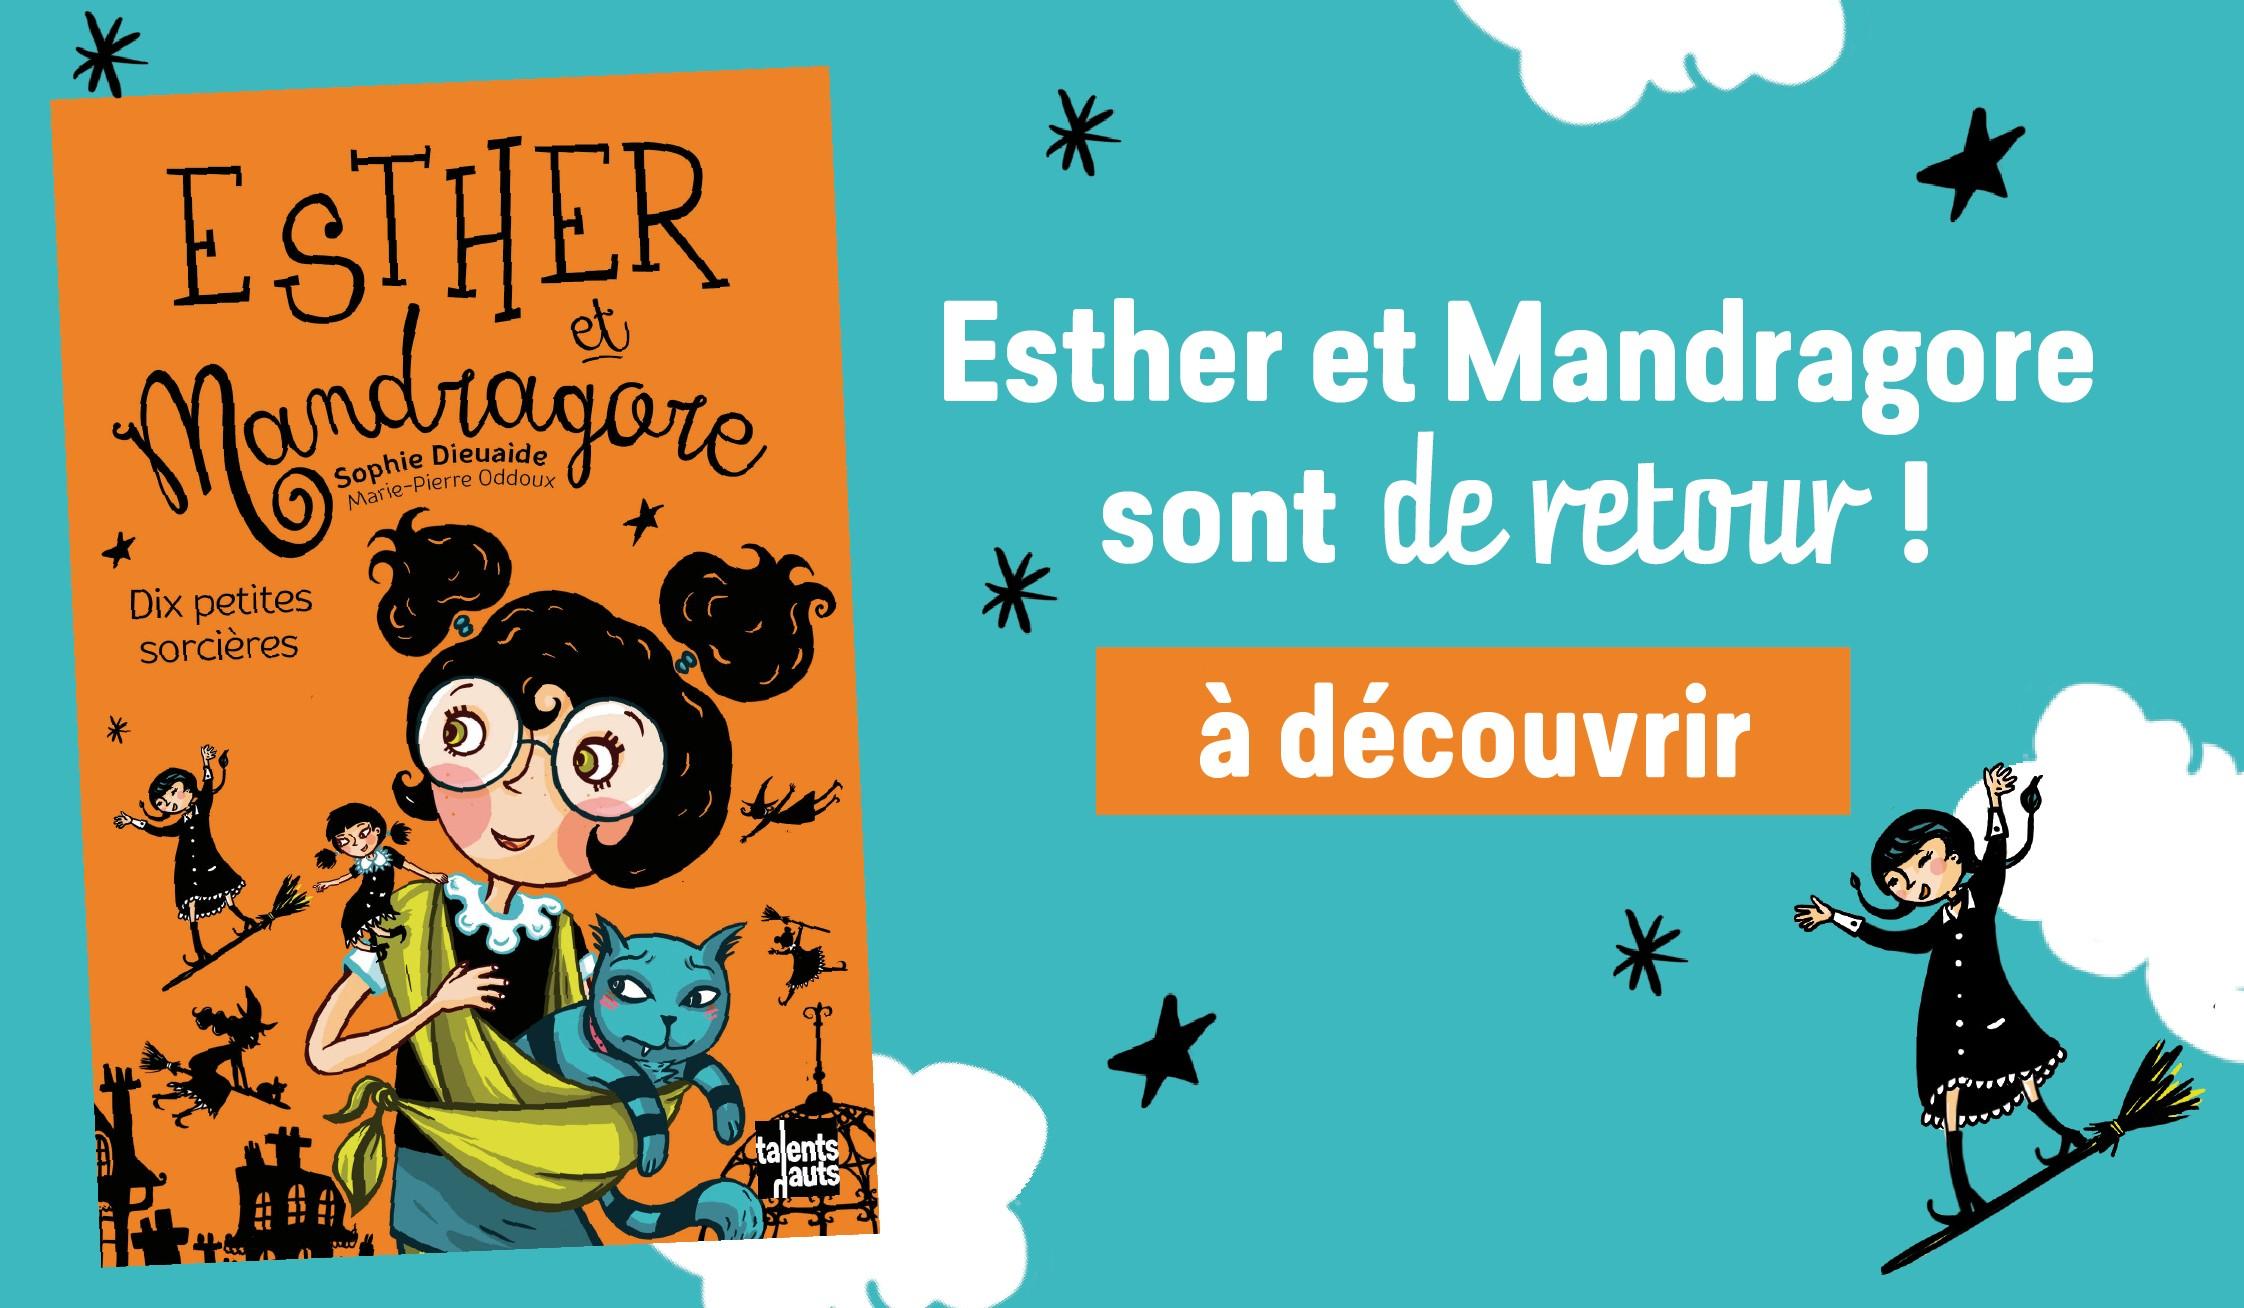 Esther et Mandragore, dix petites sorcières